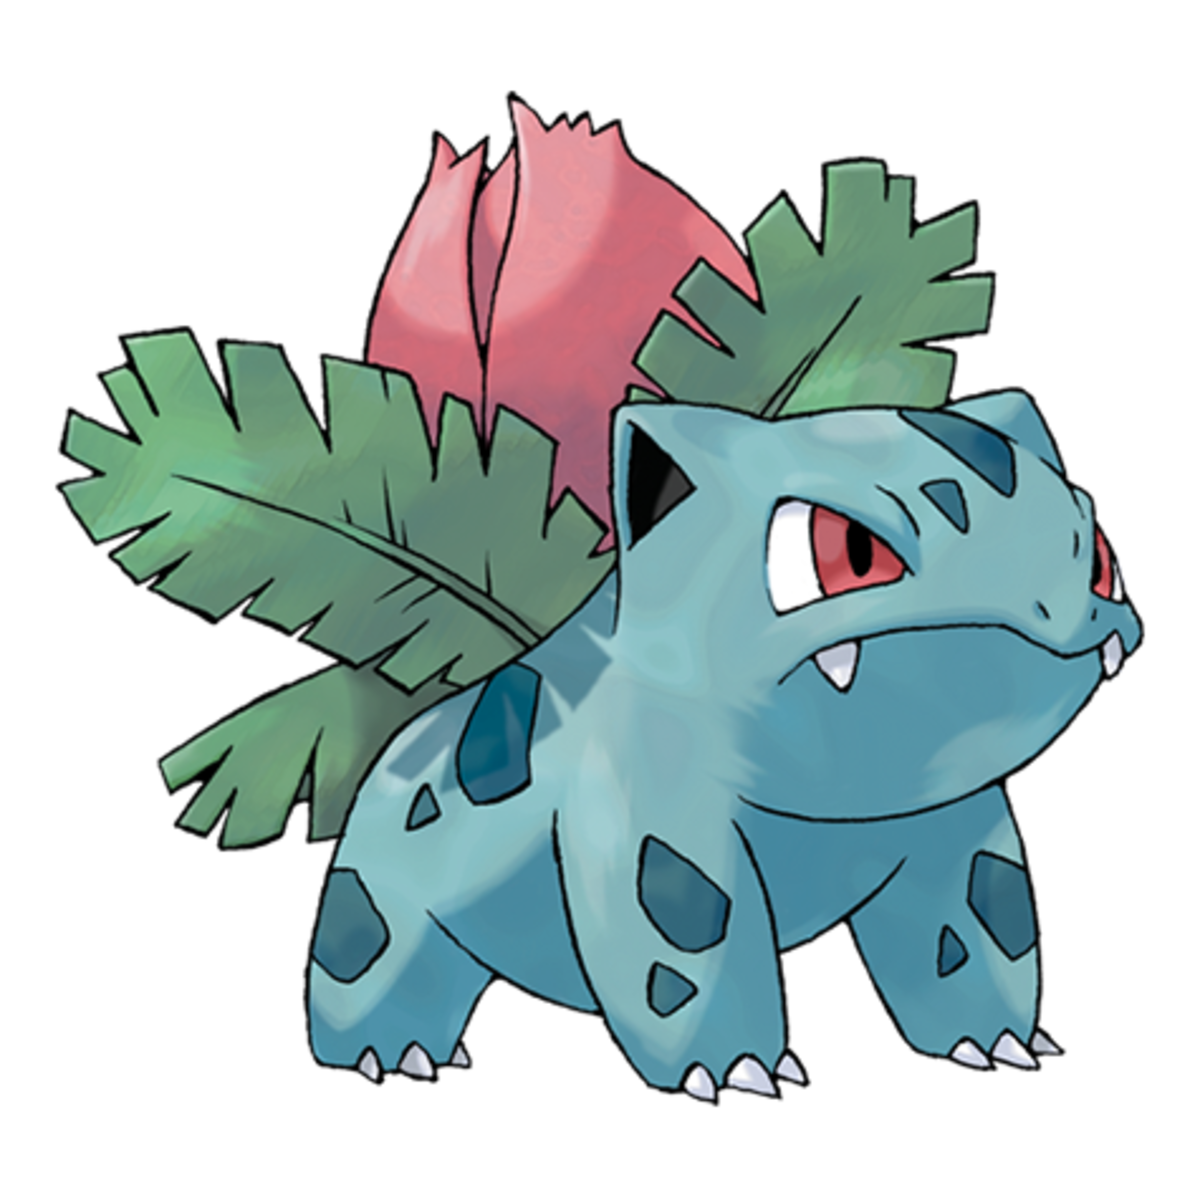 Pokémon: Ivysaur Nicknames